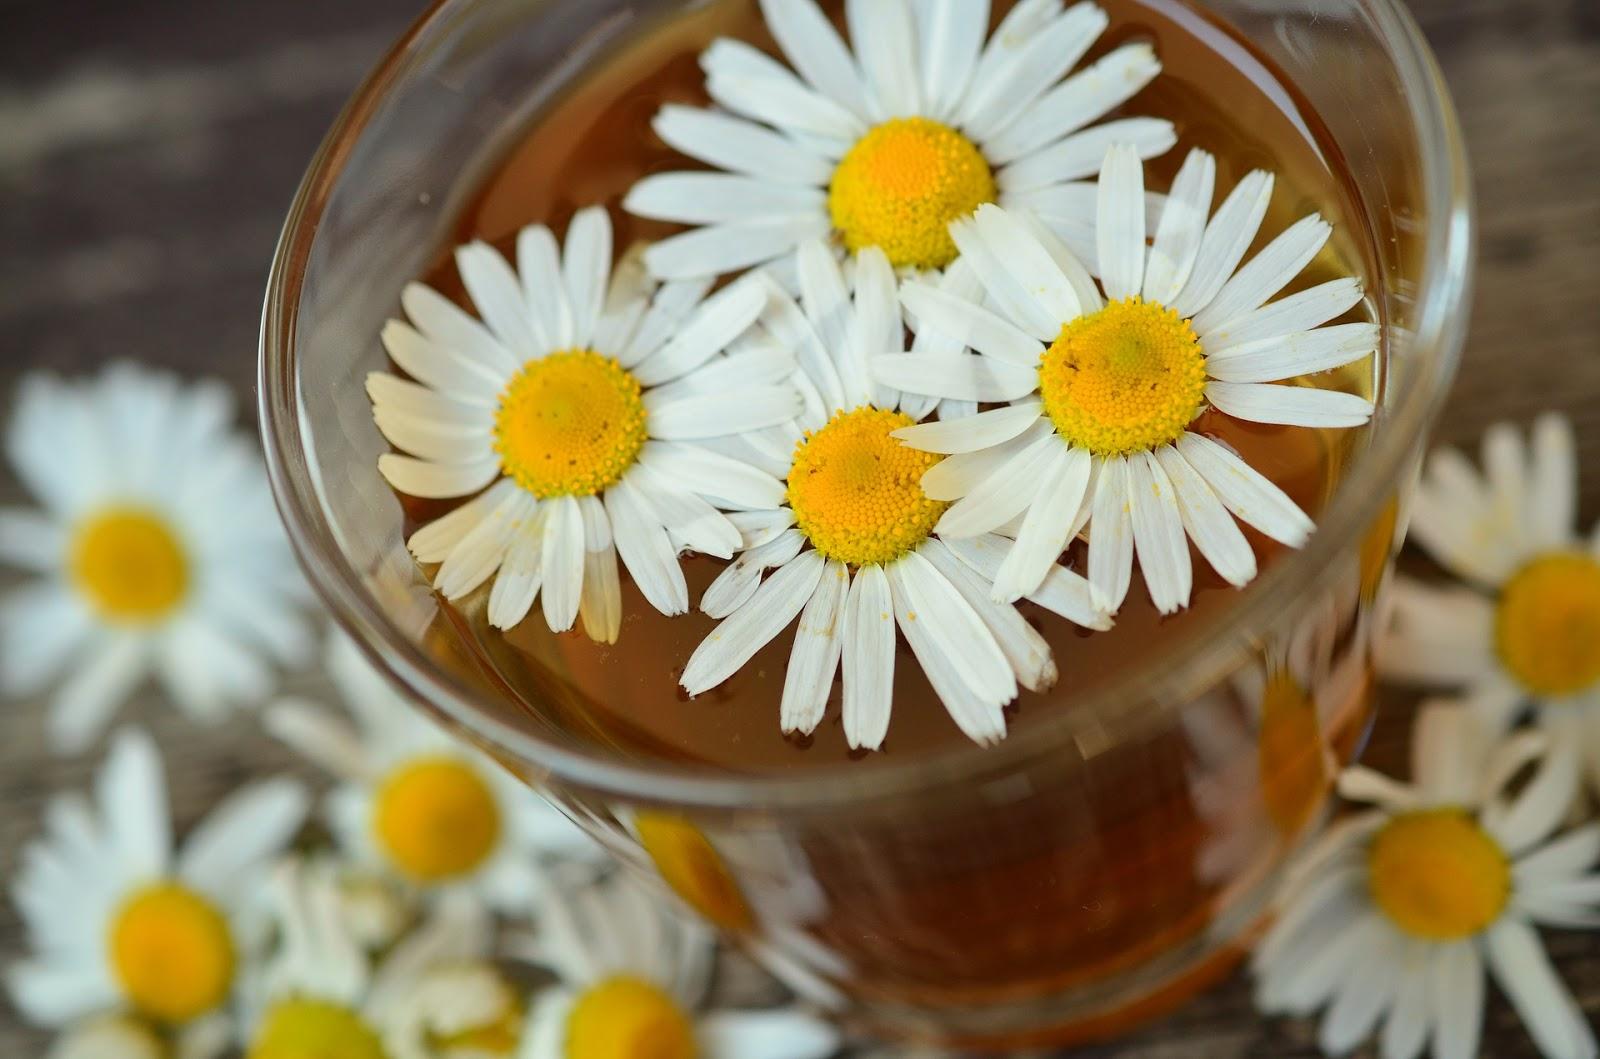 https://pixabay.com/pl/rumianek-kwiaty-rumianku-829220/